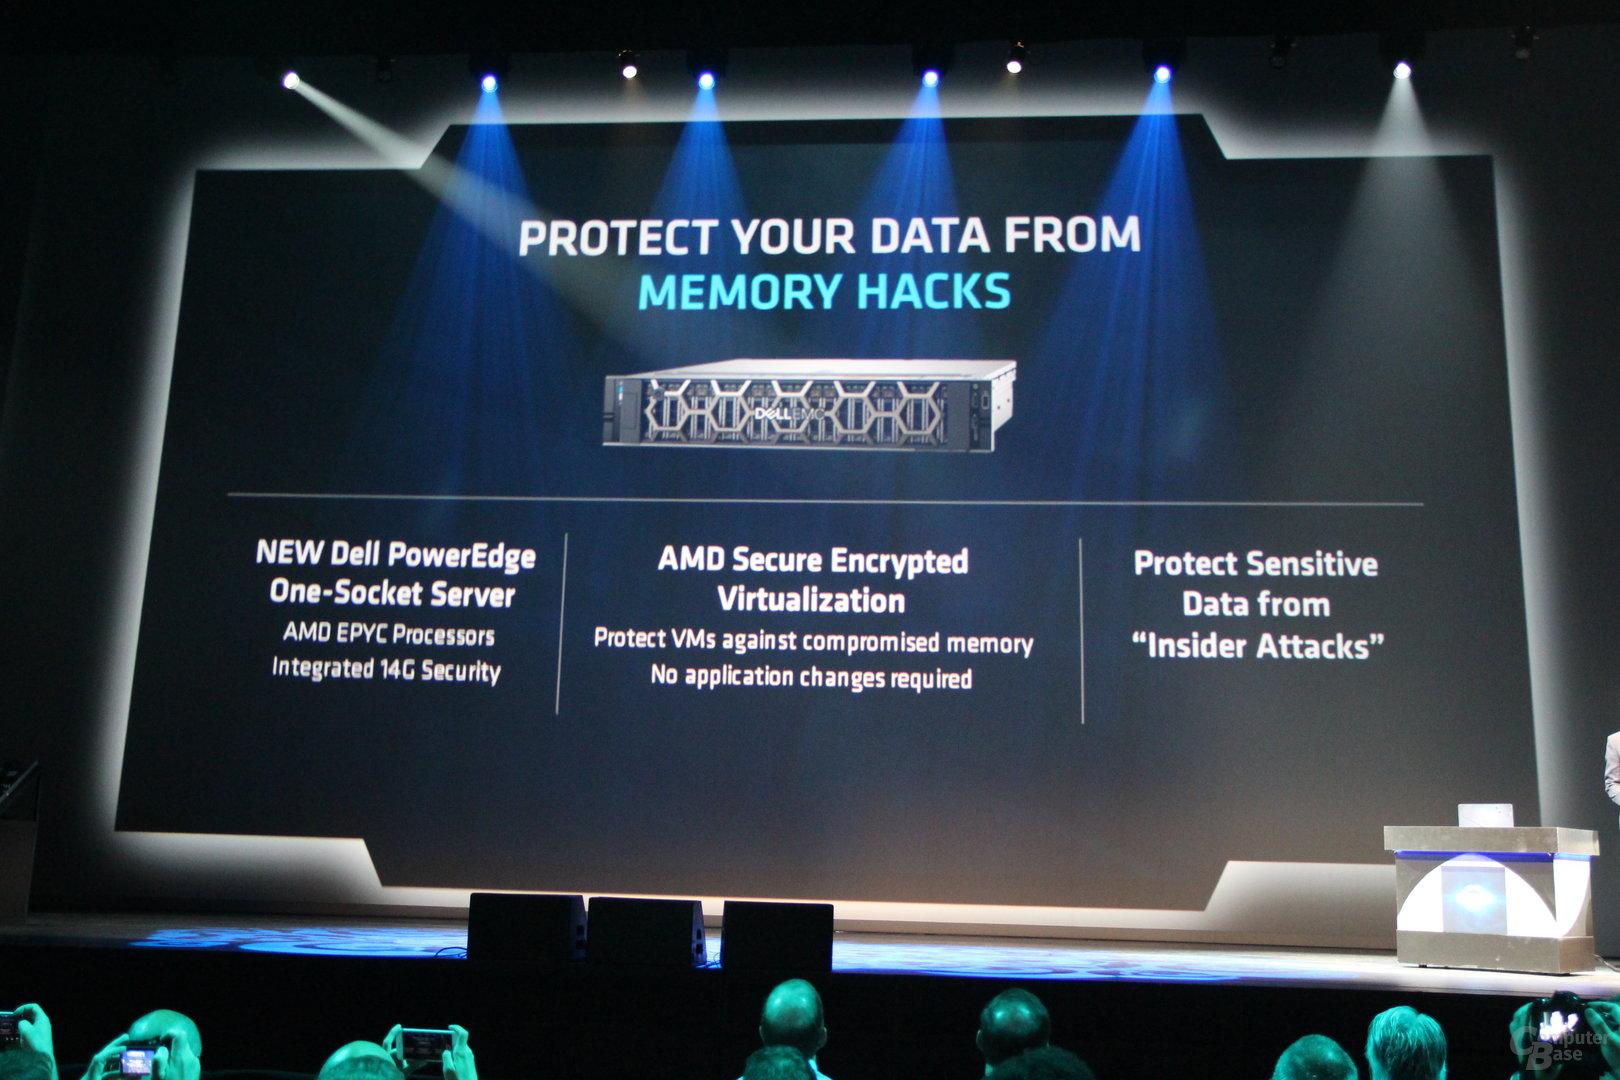 Dell EMC Poweredge